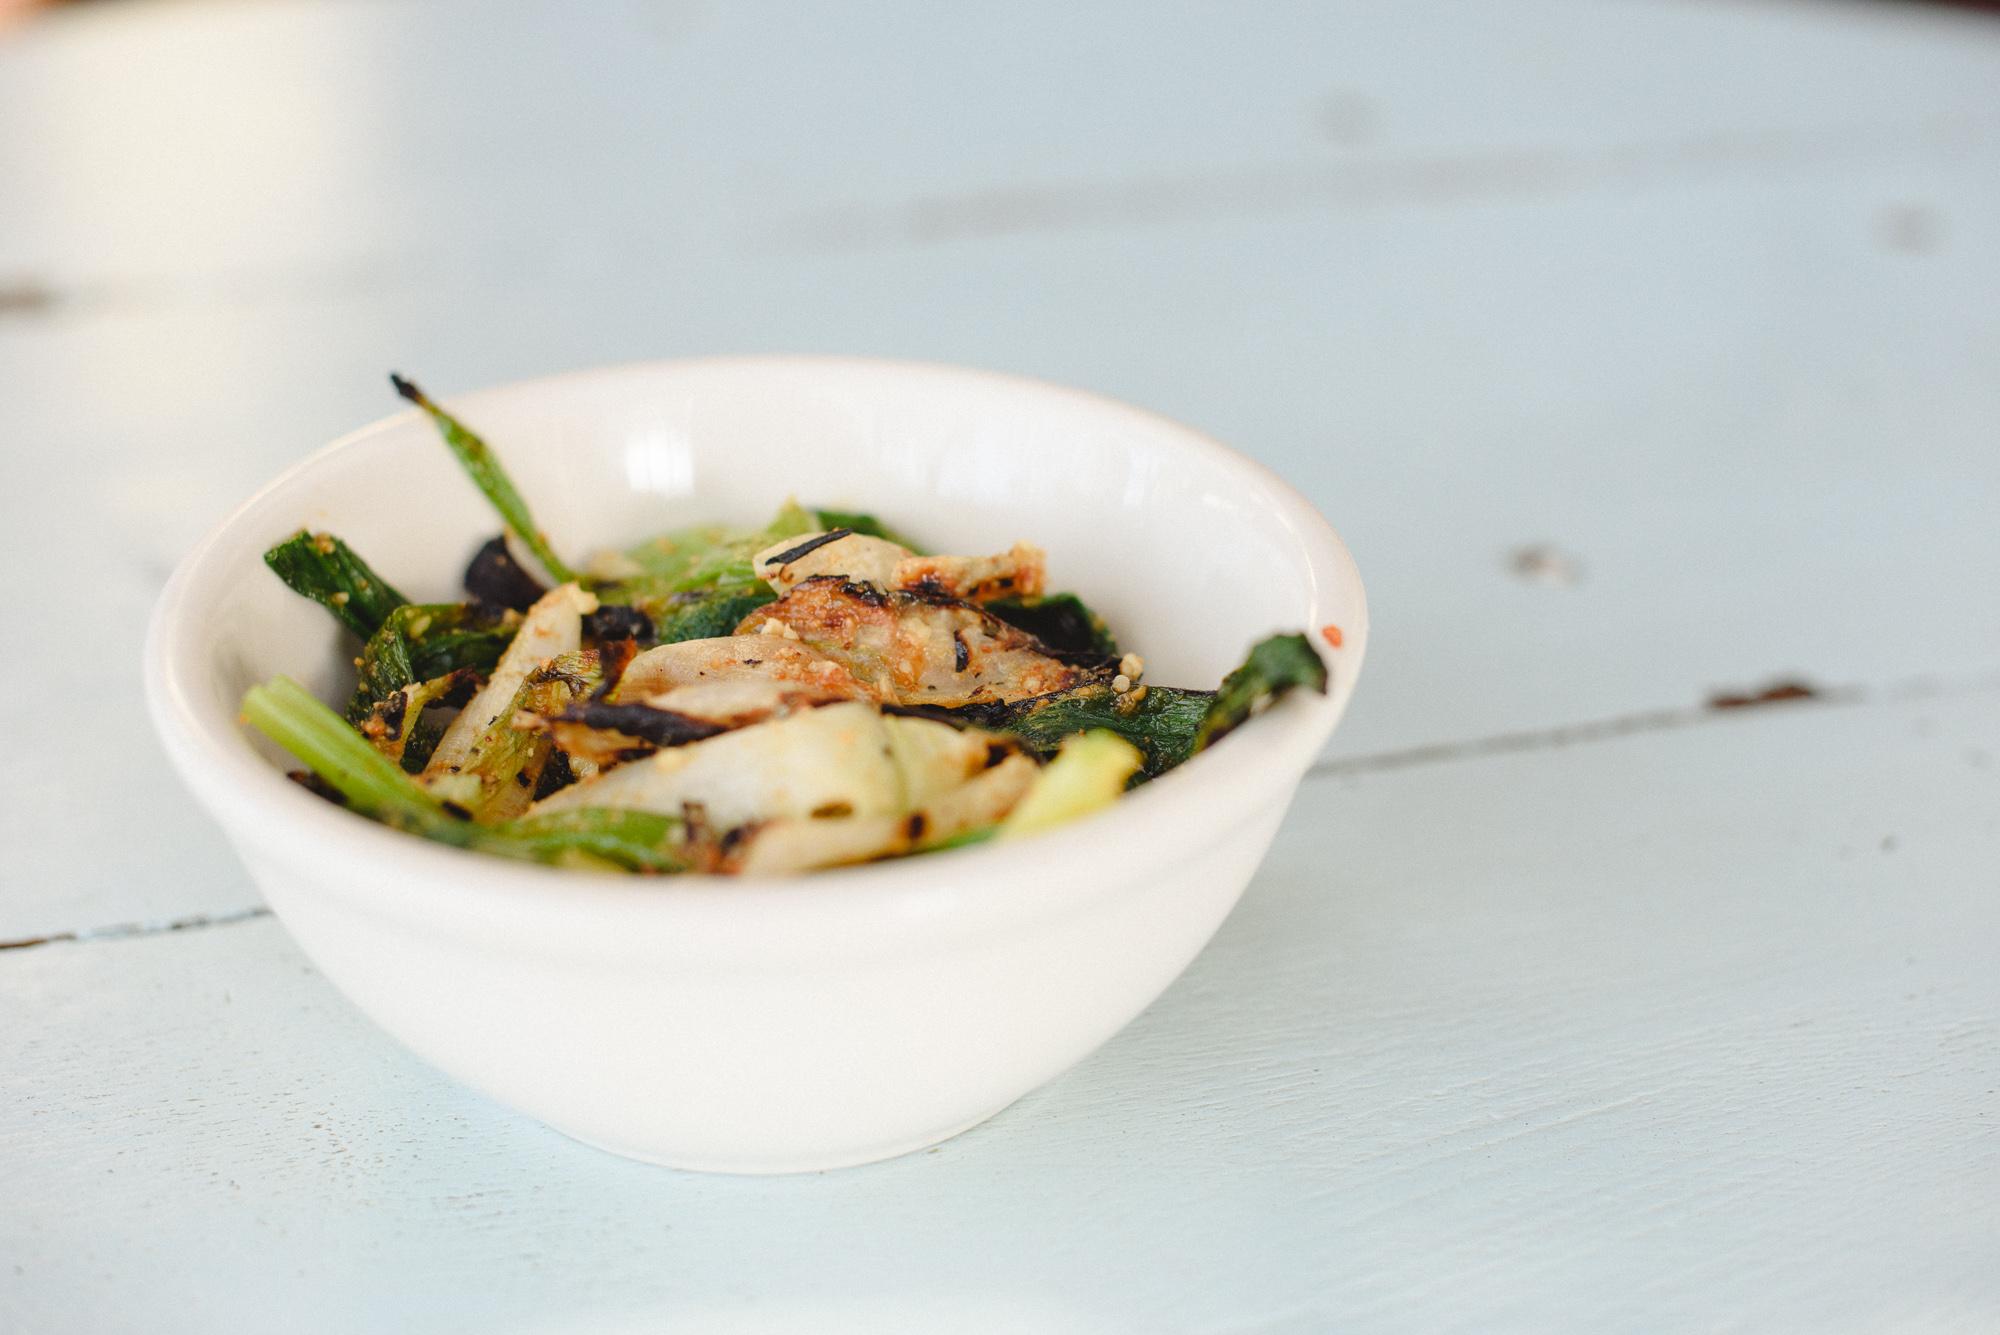 A-Tavola-Trattoria-New-Paltz-Hudson-Valley-NY-Best-Italian-Restaurant-165.jpg